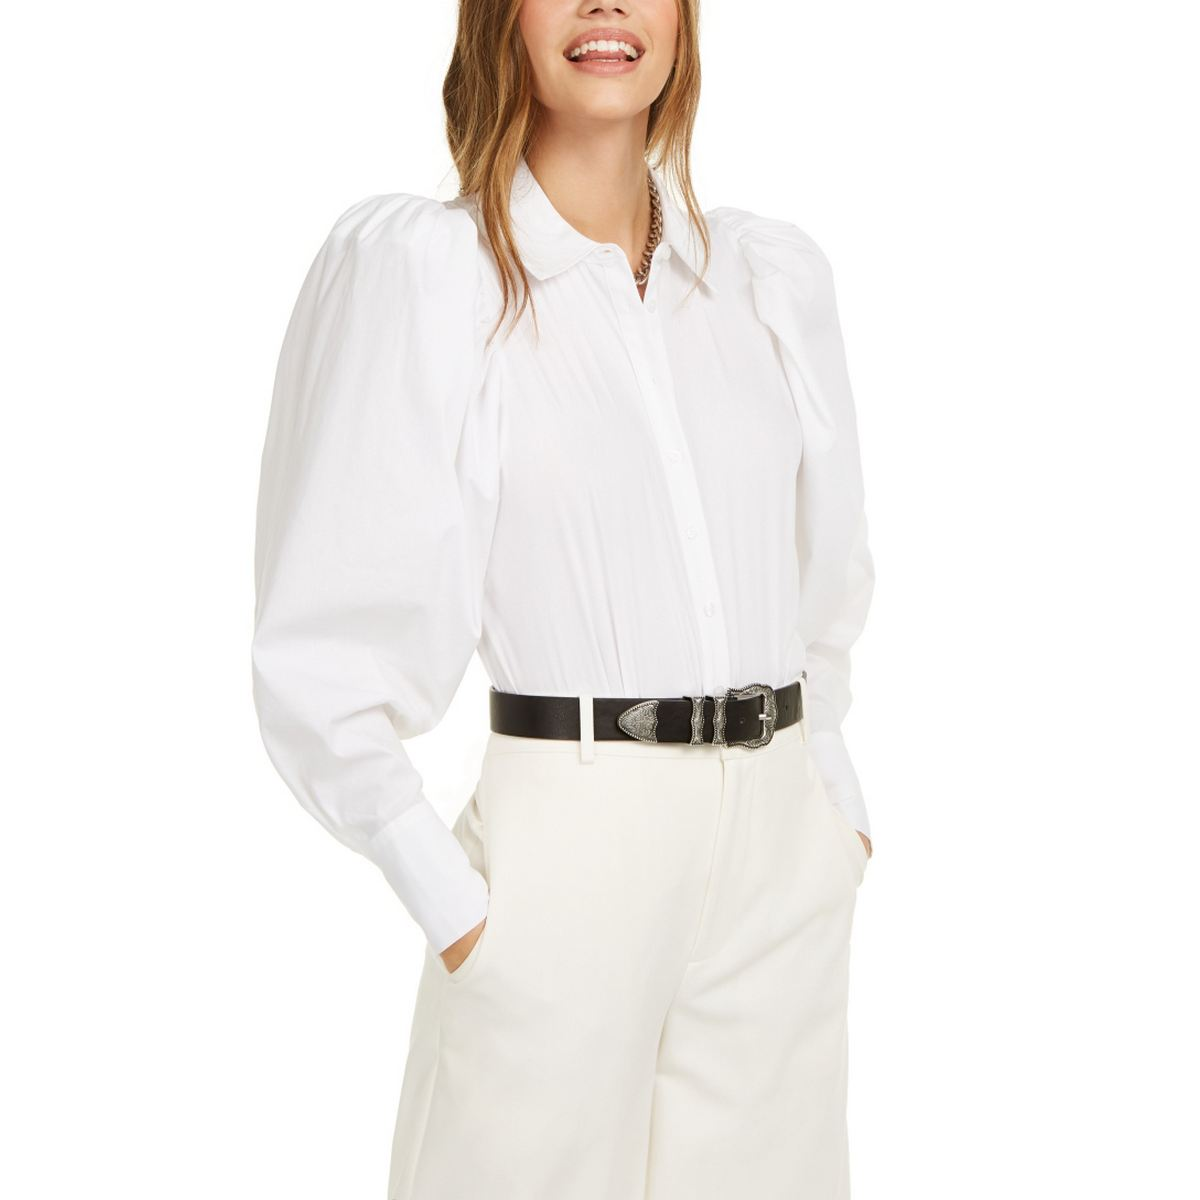 DANIELLE BERNSTEIN Women's Puff Sleeve Button-down Bodysuit Shirt Top XL TEDO